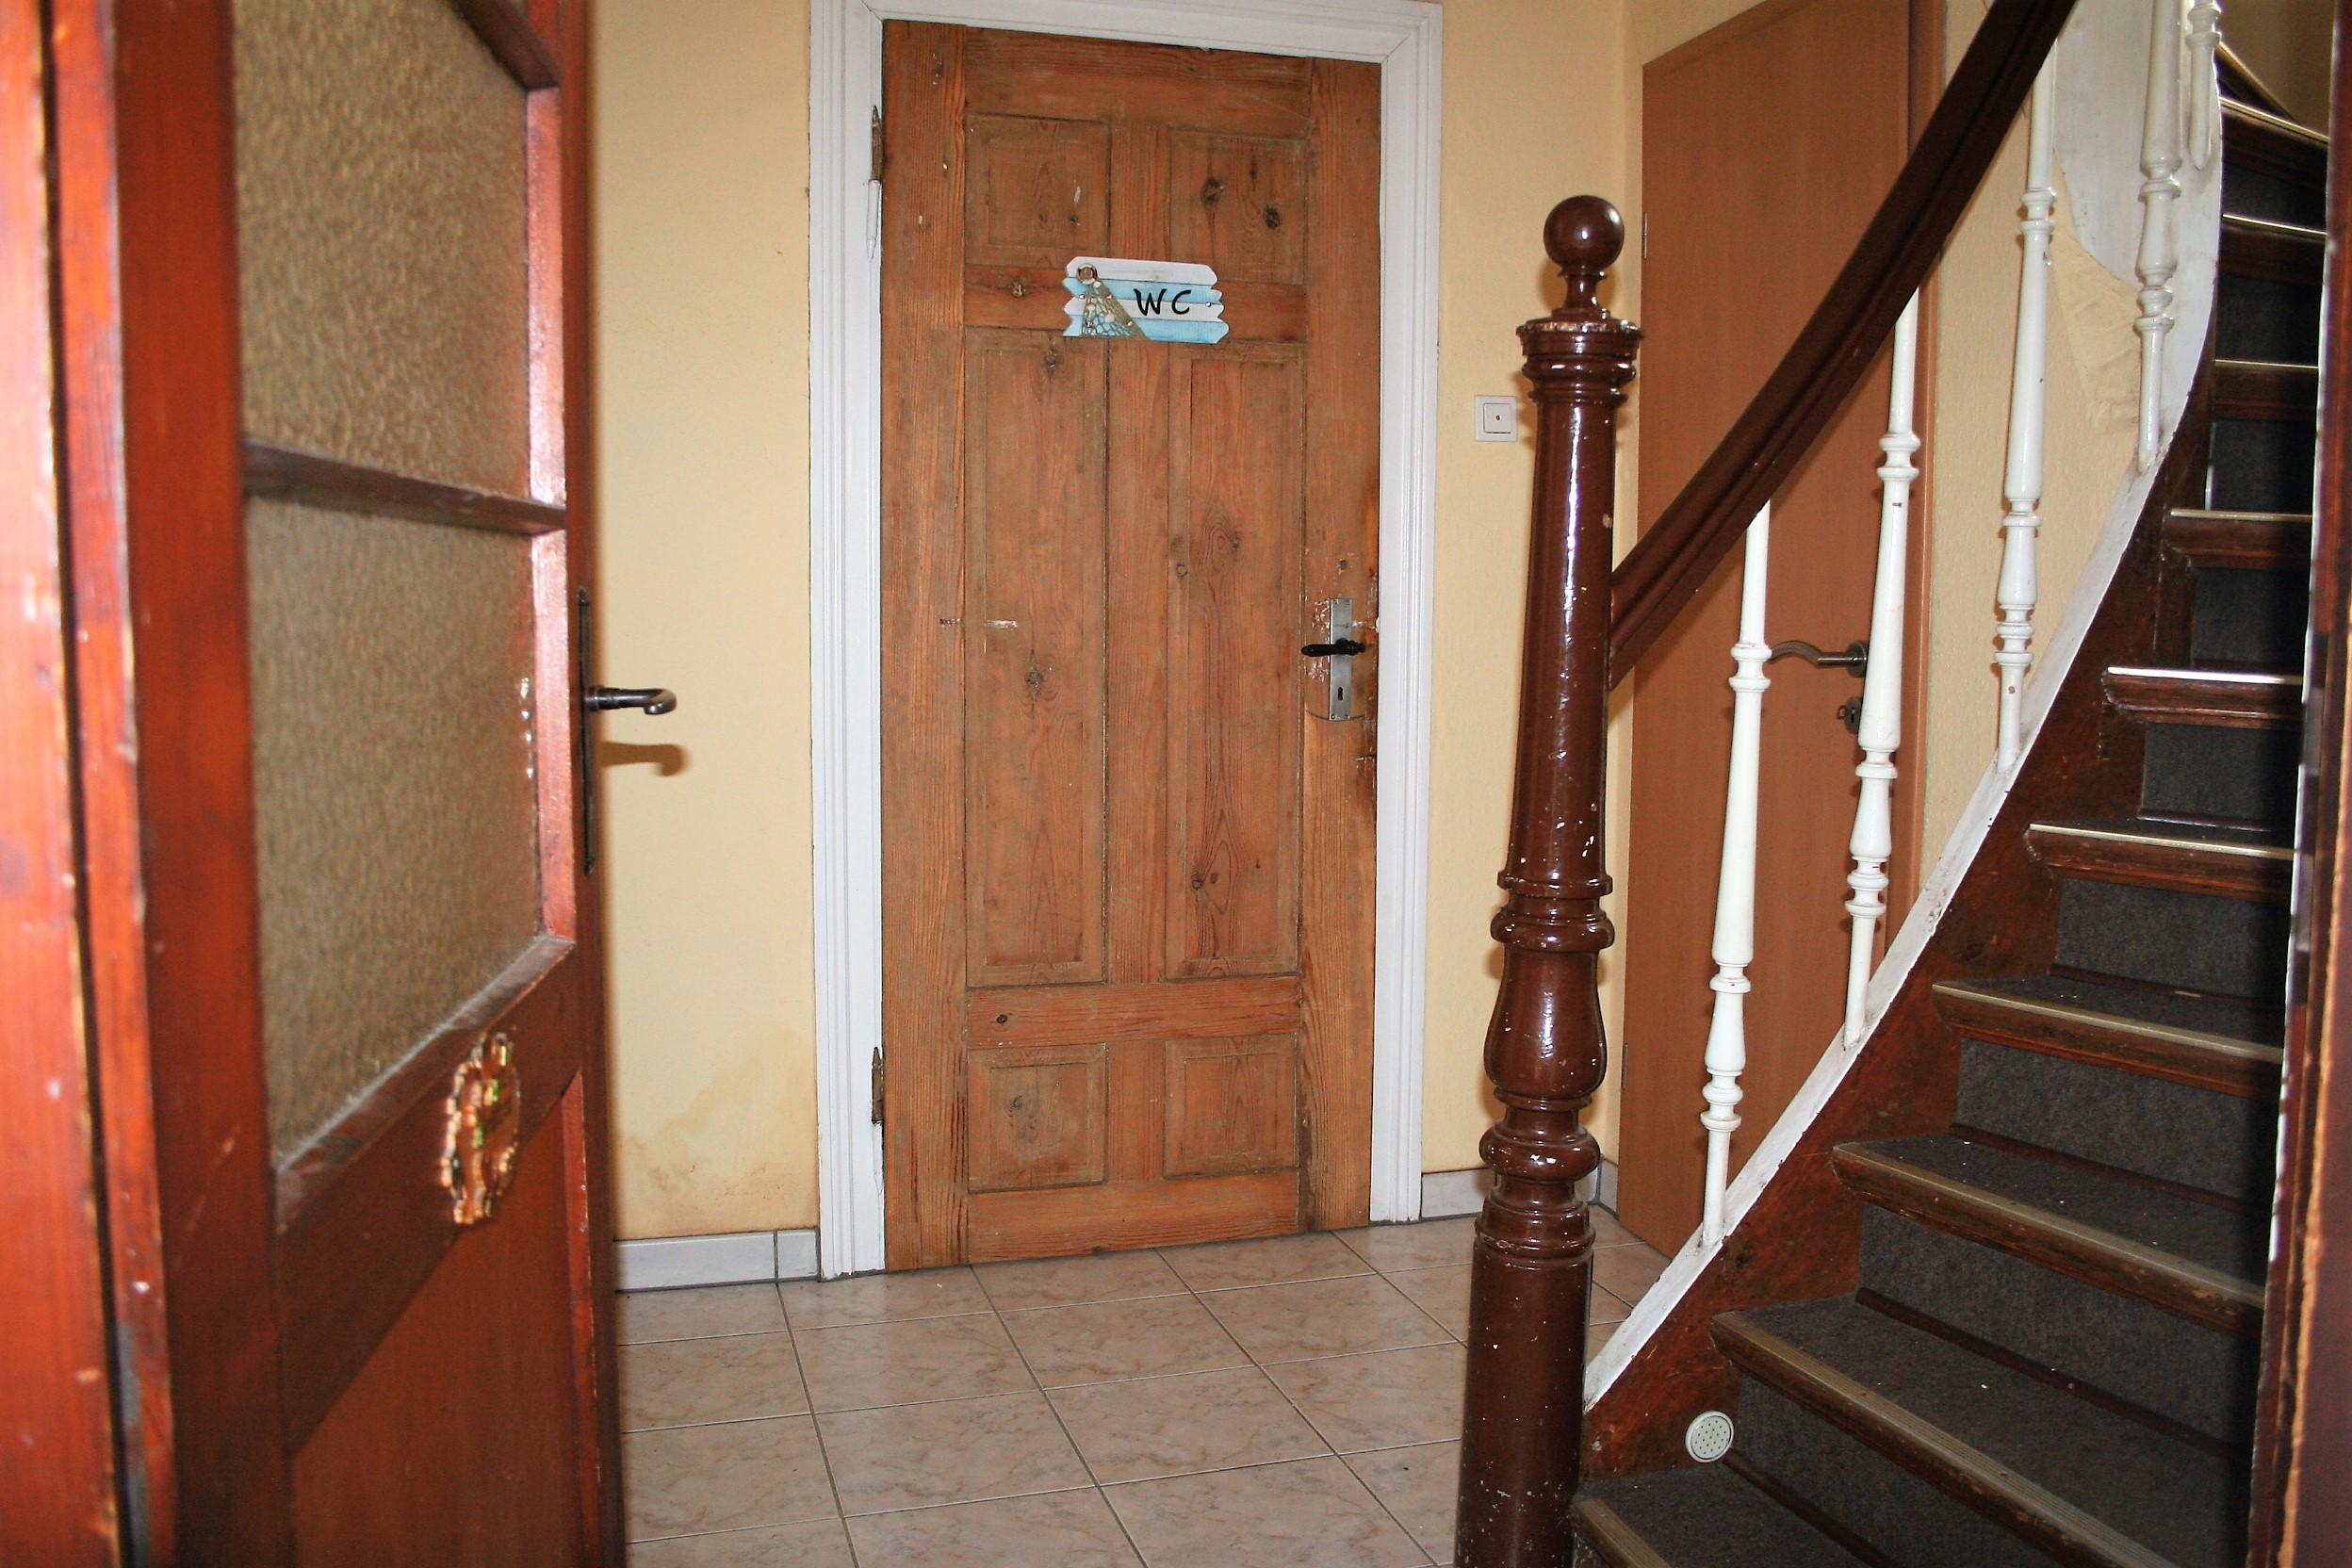 Einfamilienhaus Nietleben - Treppenhaus